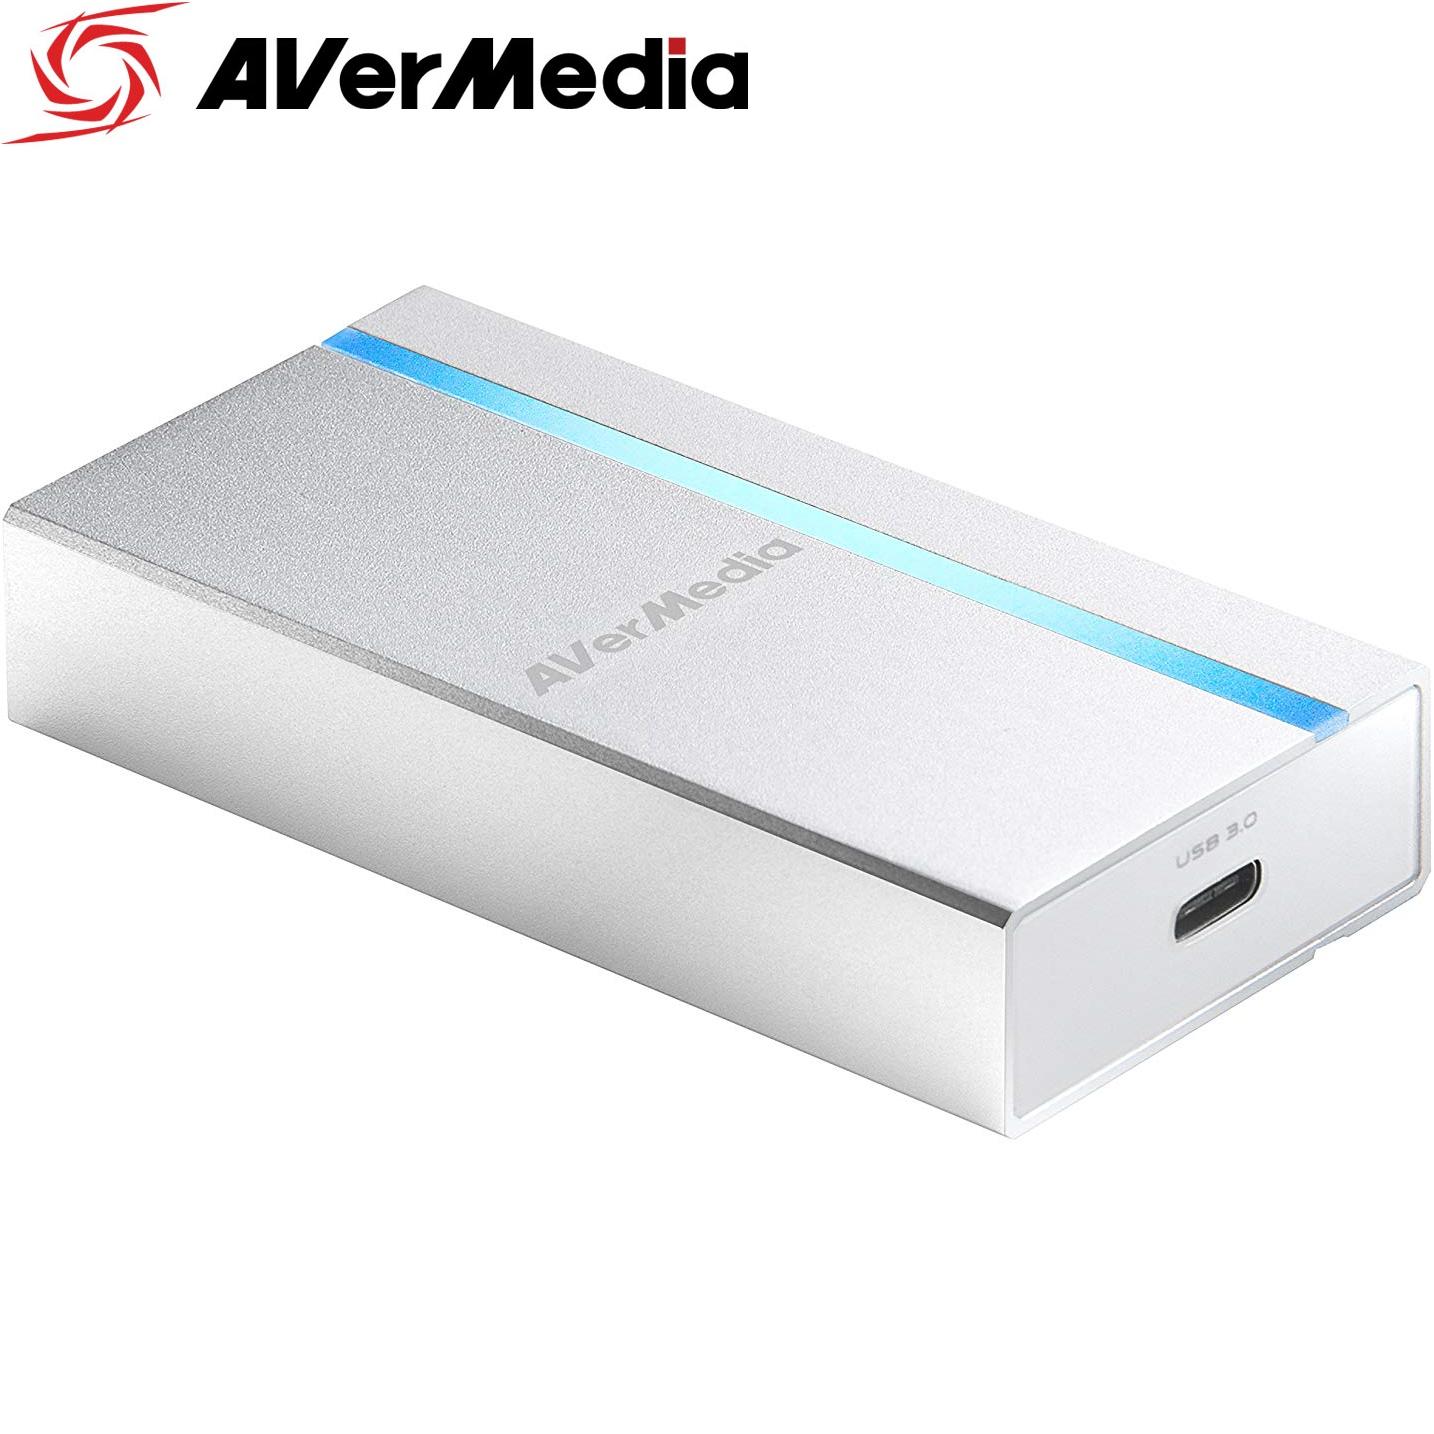 AVerMedia ExtremeCap UVC BU110 실시간 방송 컨버터